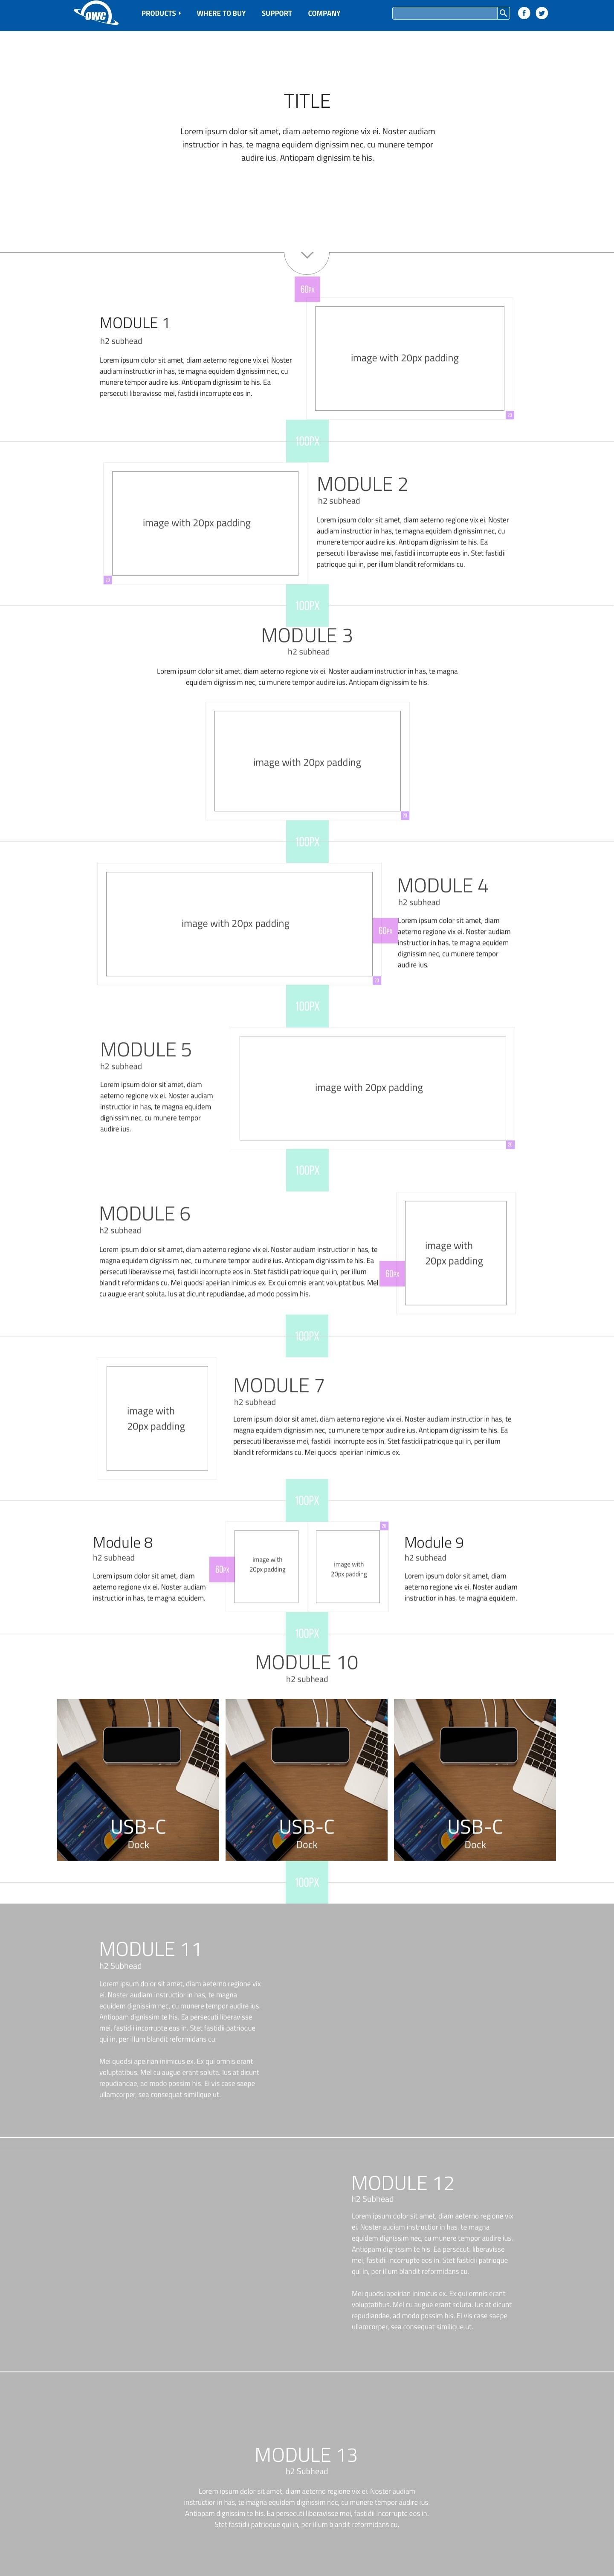 Module Page.jpg